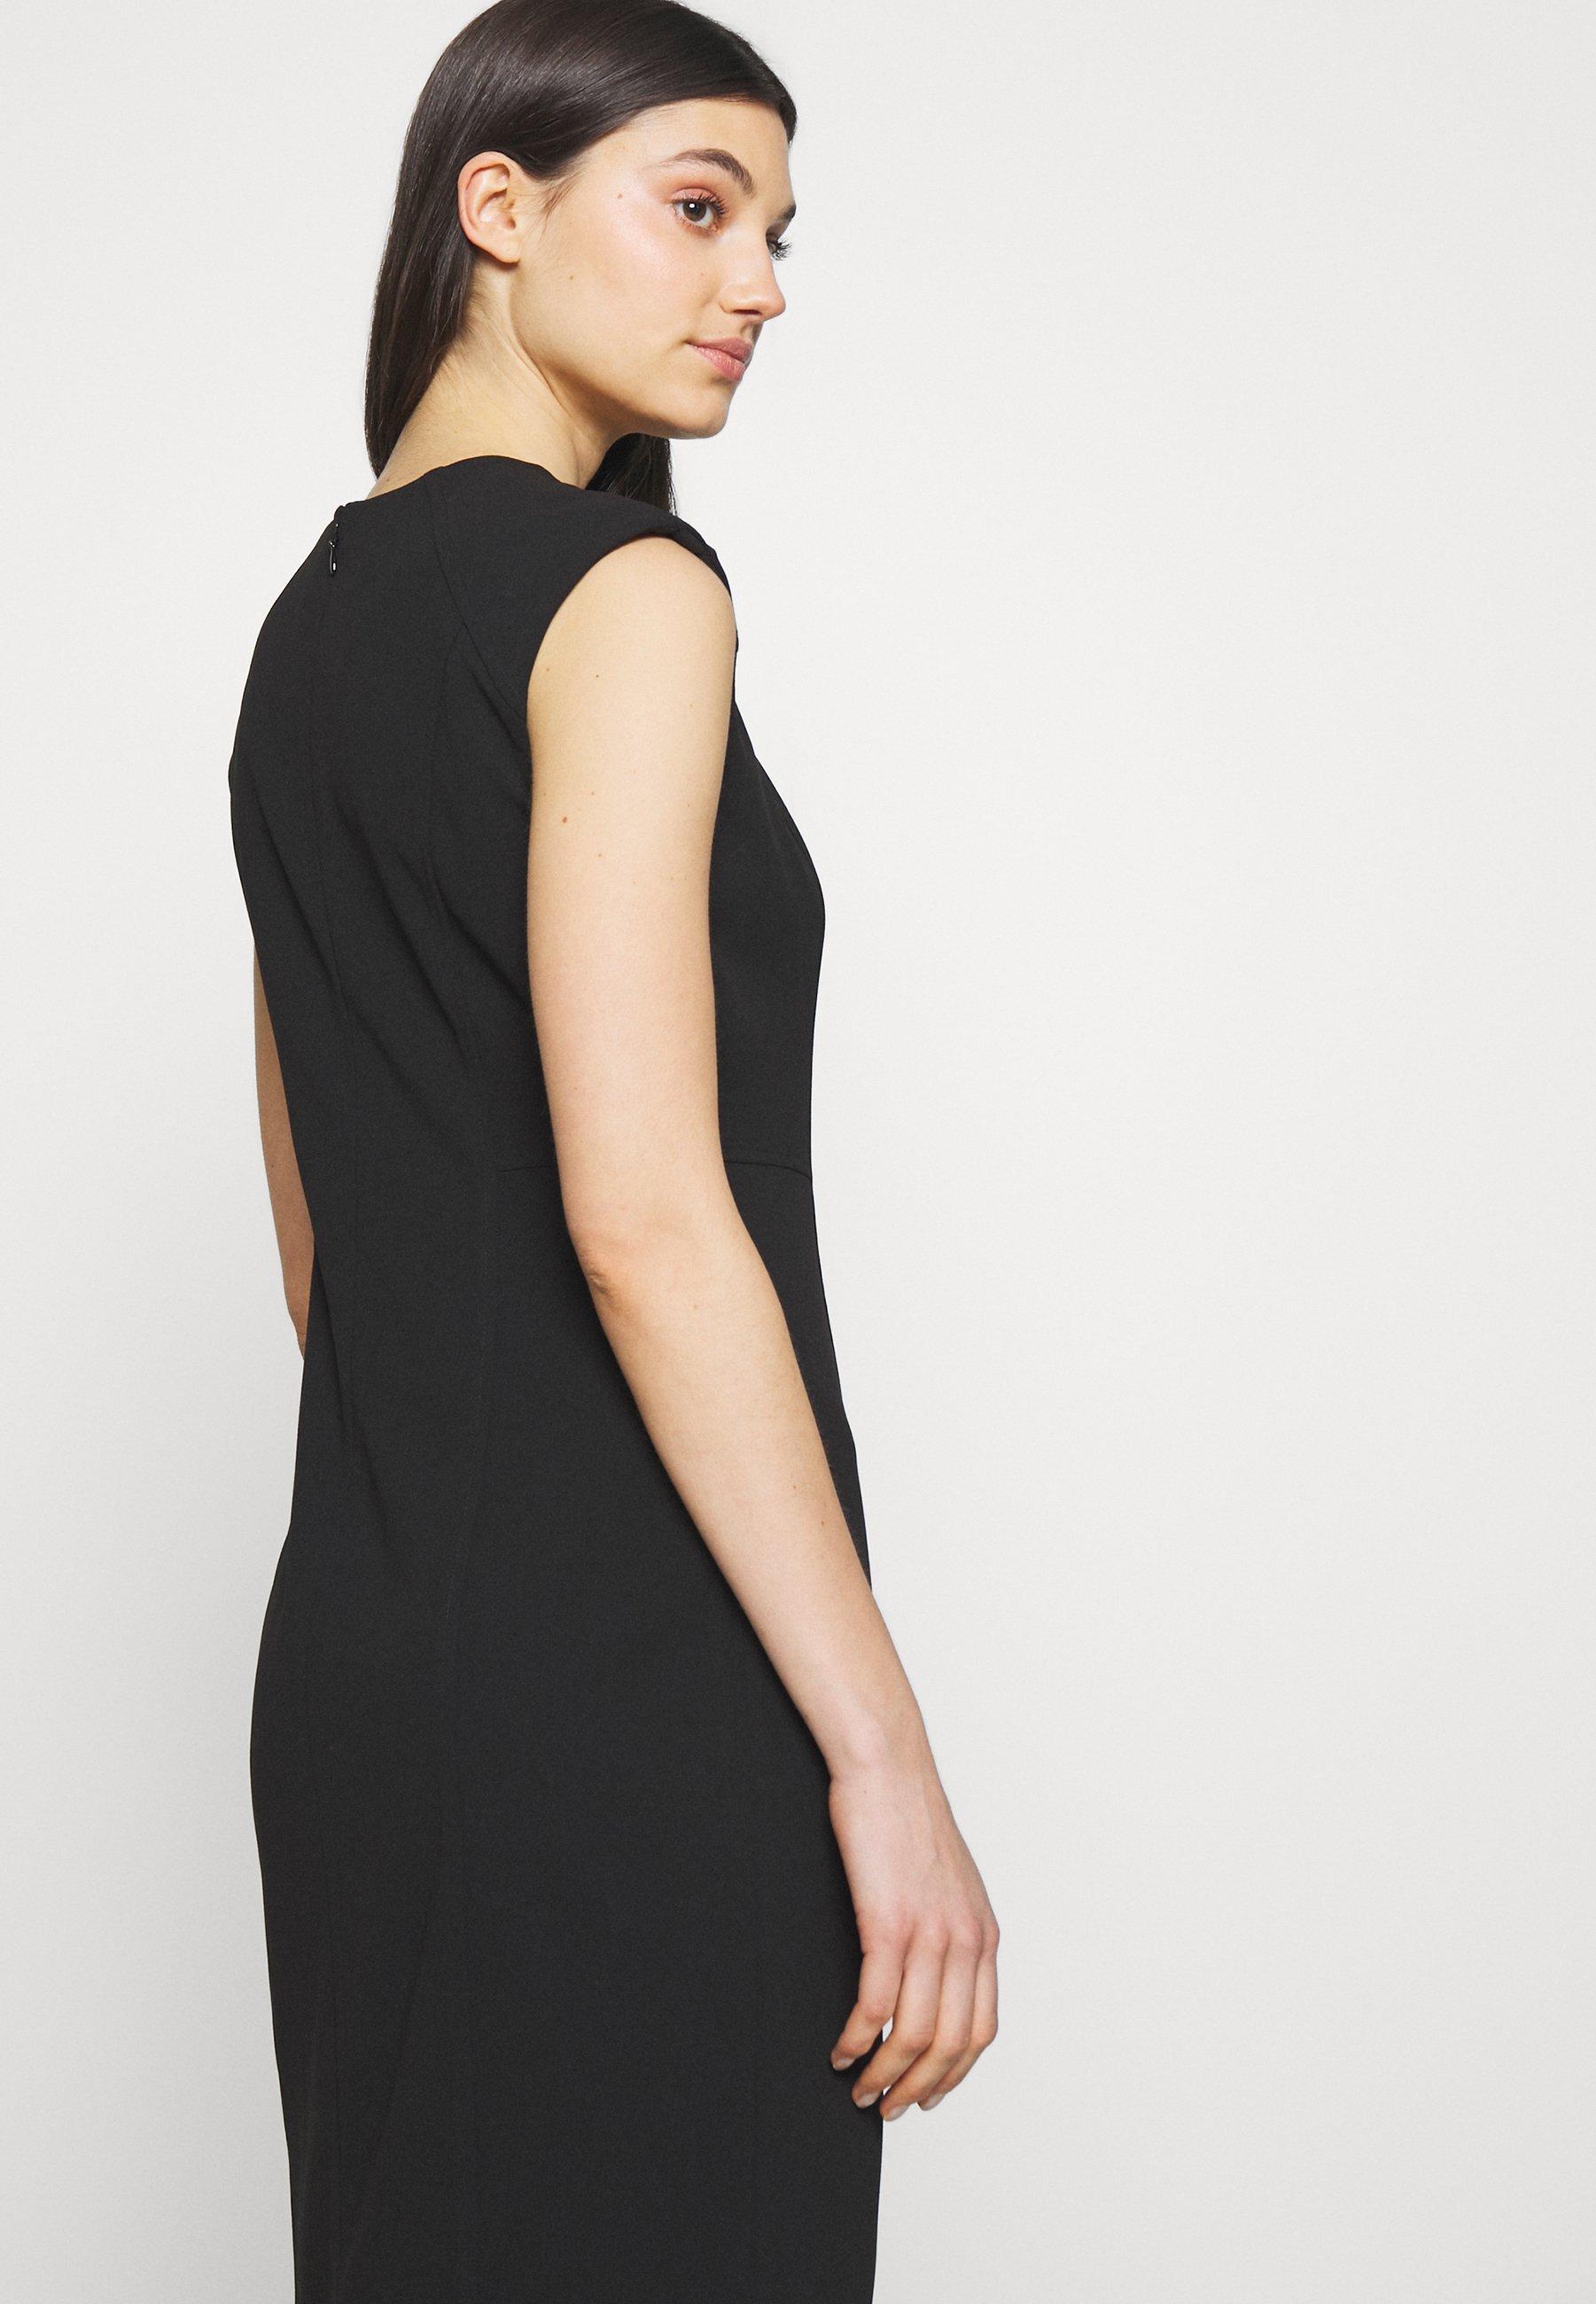 DKNY SHEATH WITH SHOULDER DETAIL - Sukienka etui - black